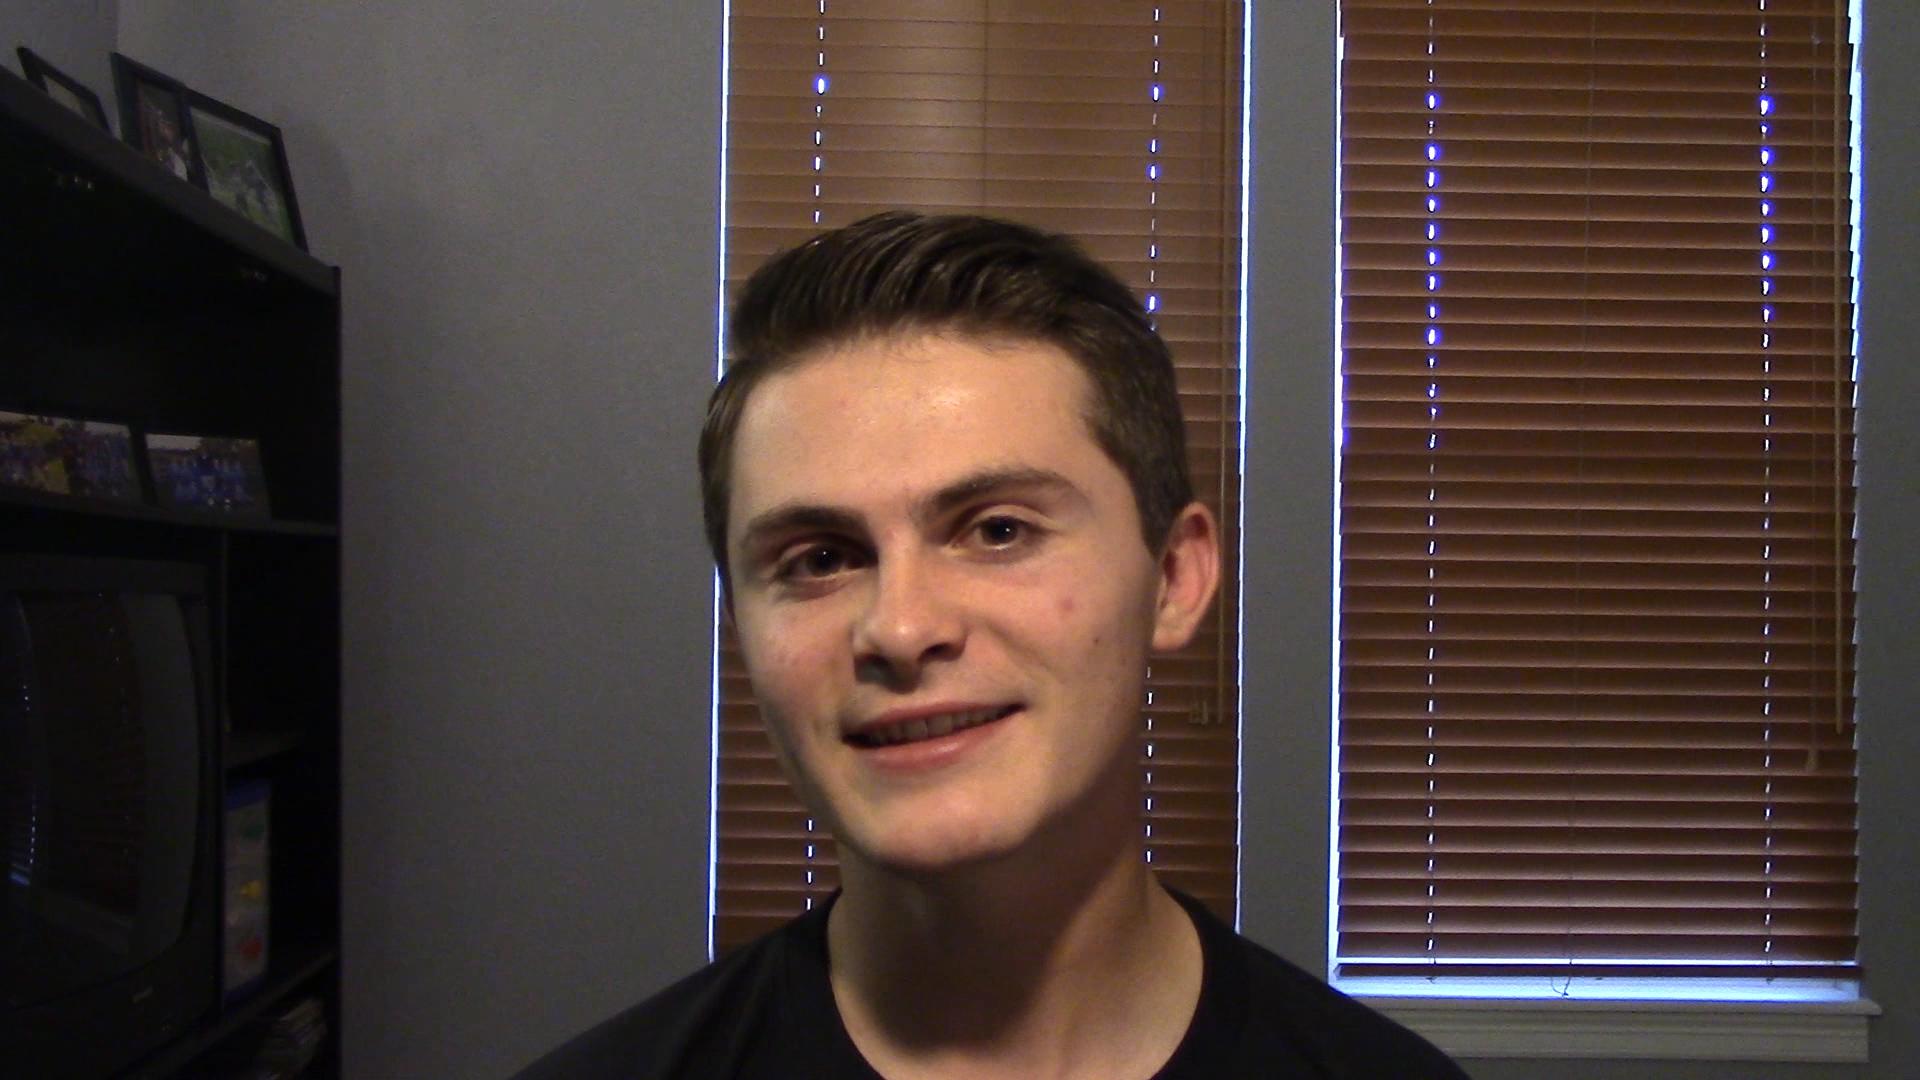 Freshman in college dating junior